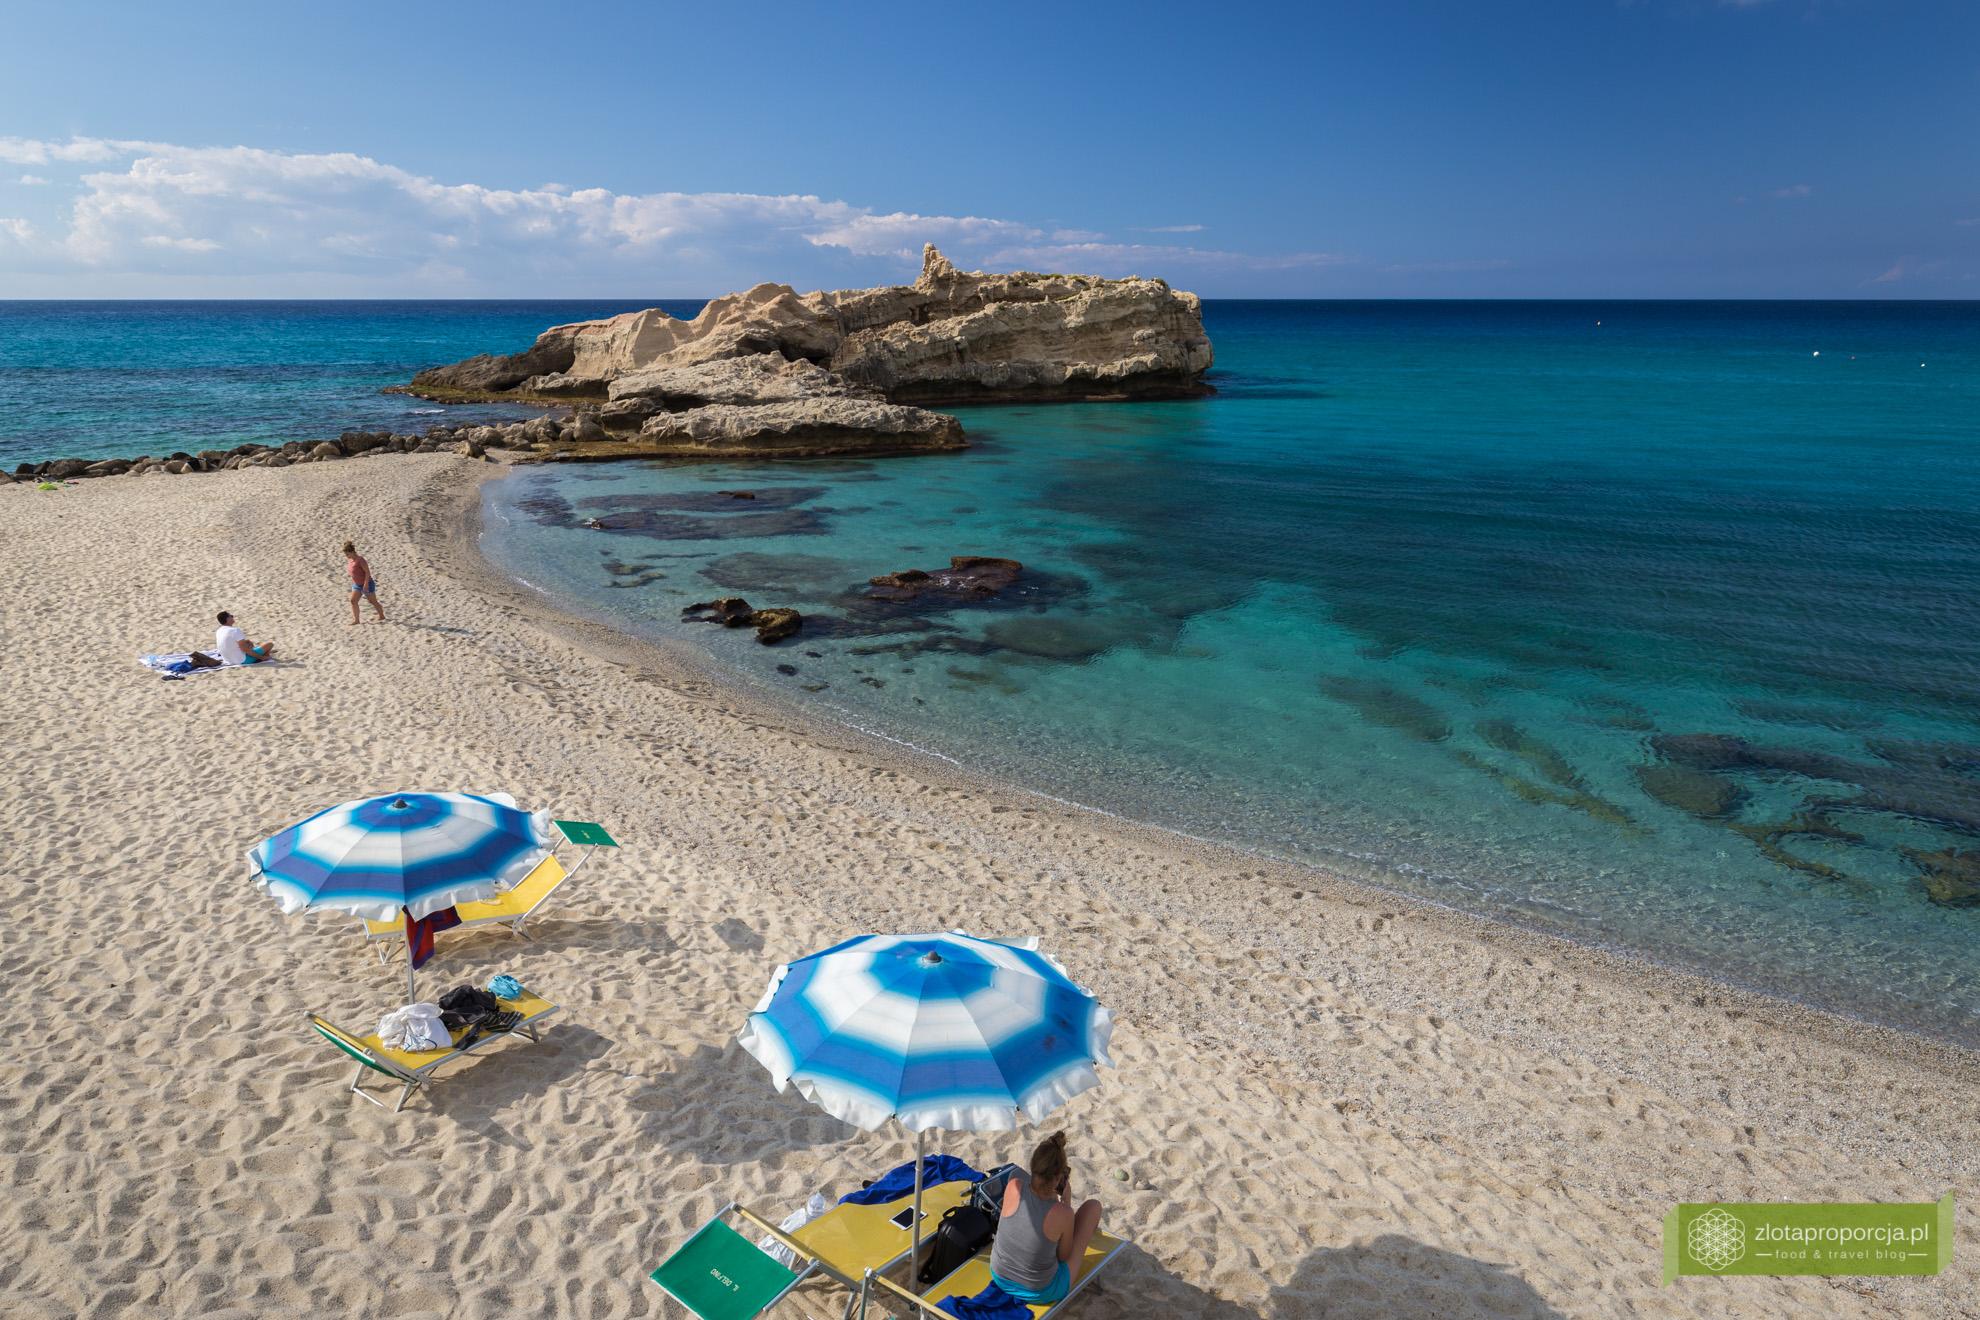 Kalabria, plaże Kalabrii, Capo Vaticano, plaże Capo Vaticano, Baia di Riaci